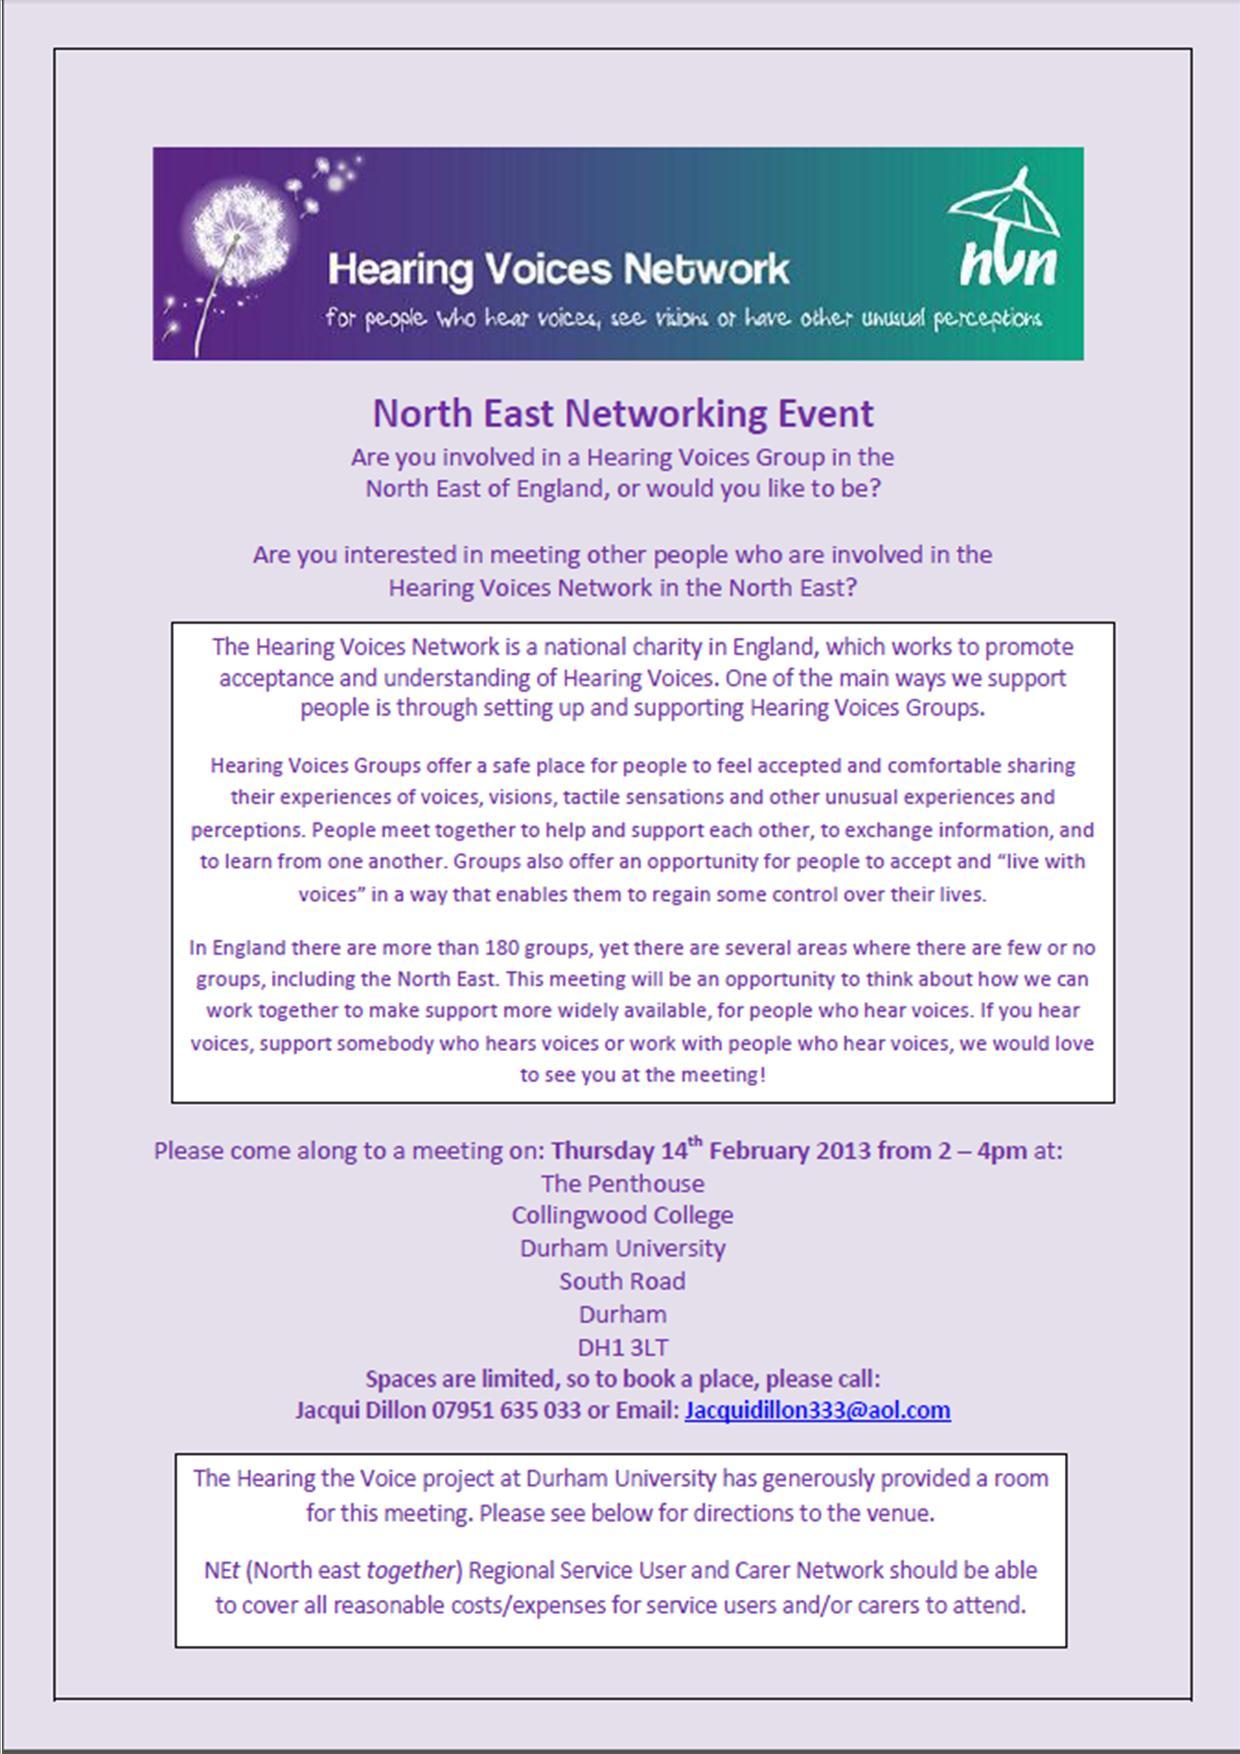 HVN North East Networking Event flyer image